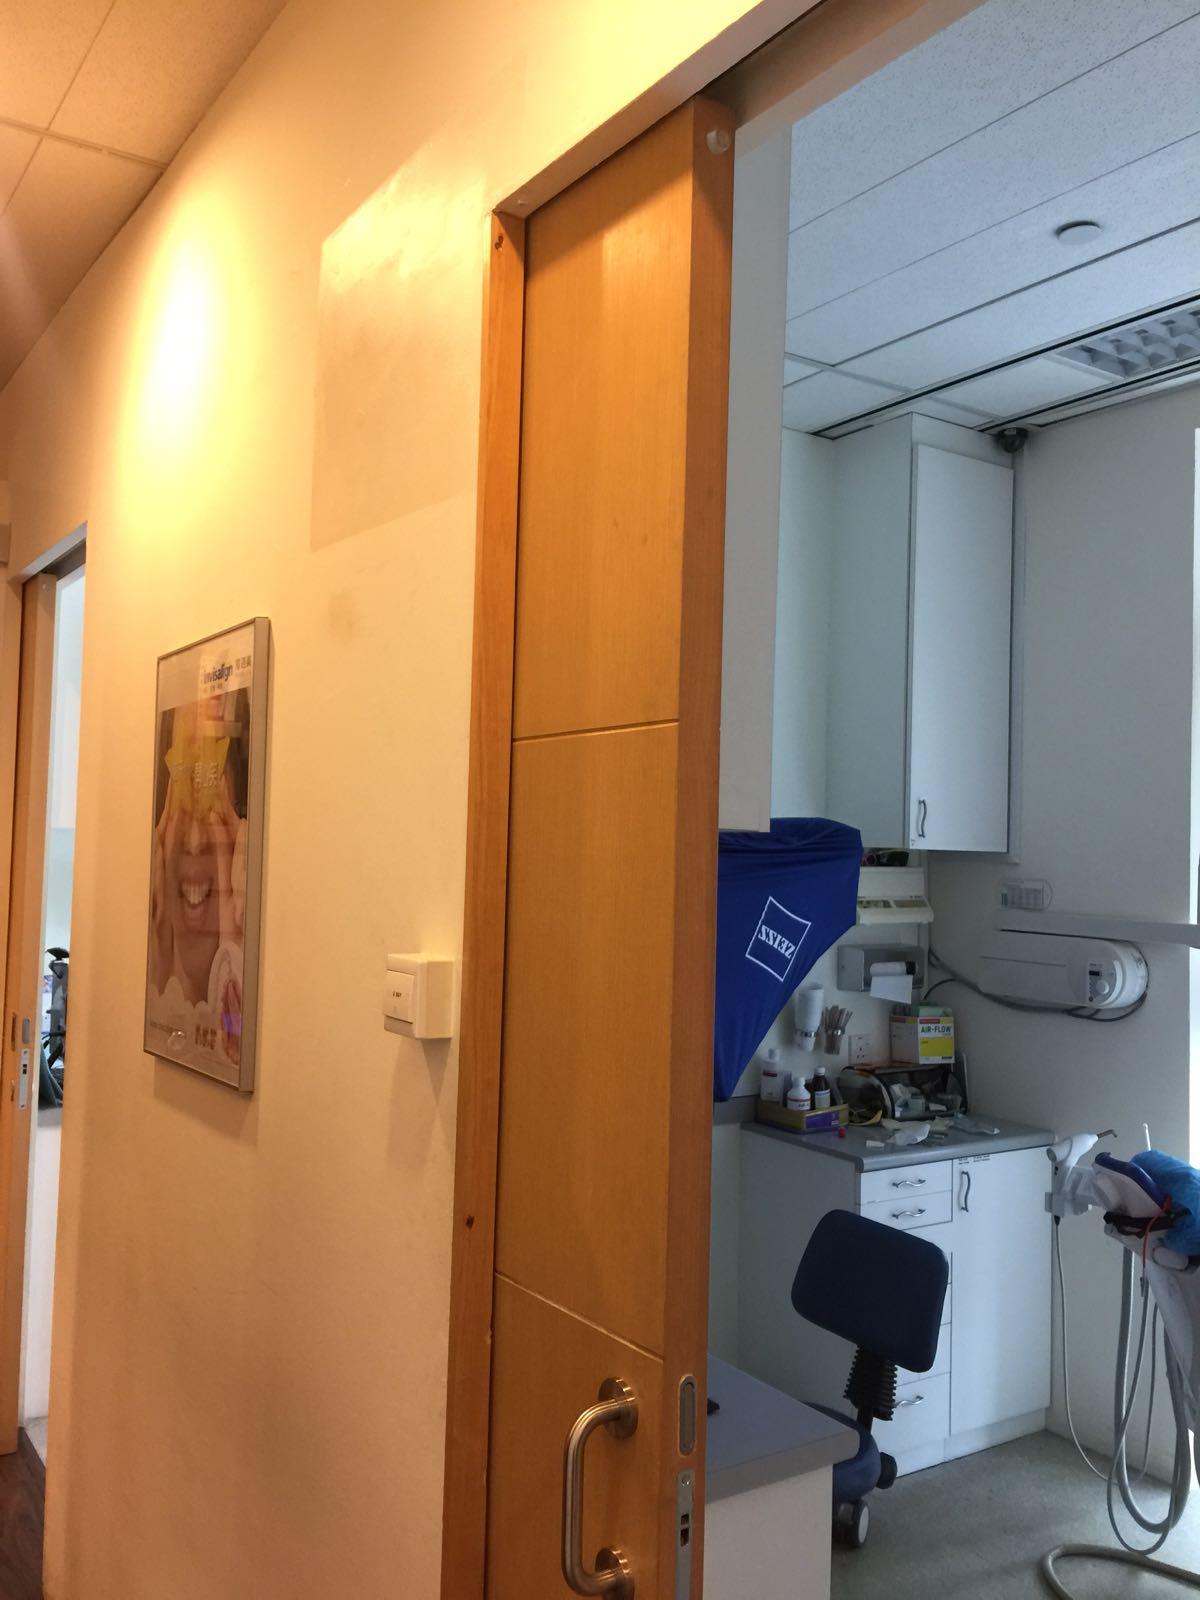 Office Sliding Door In Office Sliding Door Sliding Repair Singapore Handyman Service Electrical